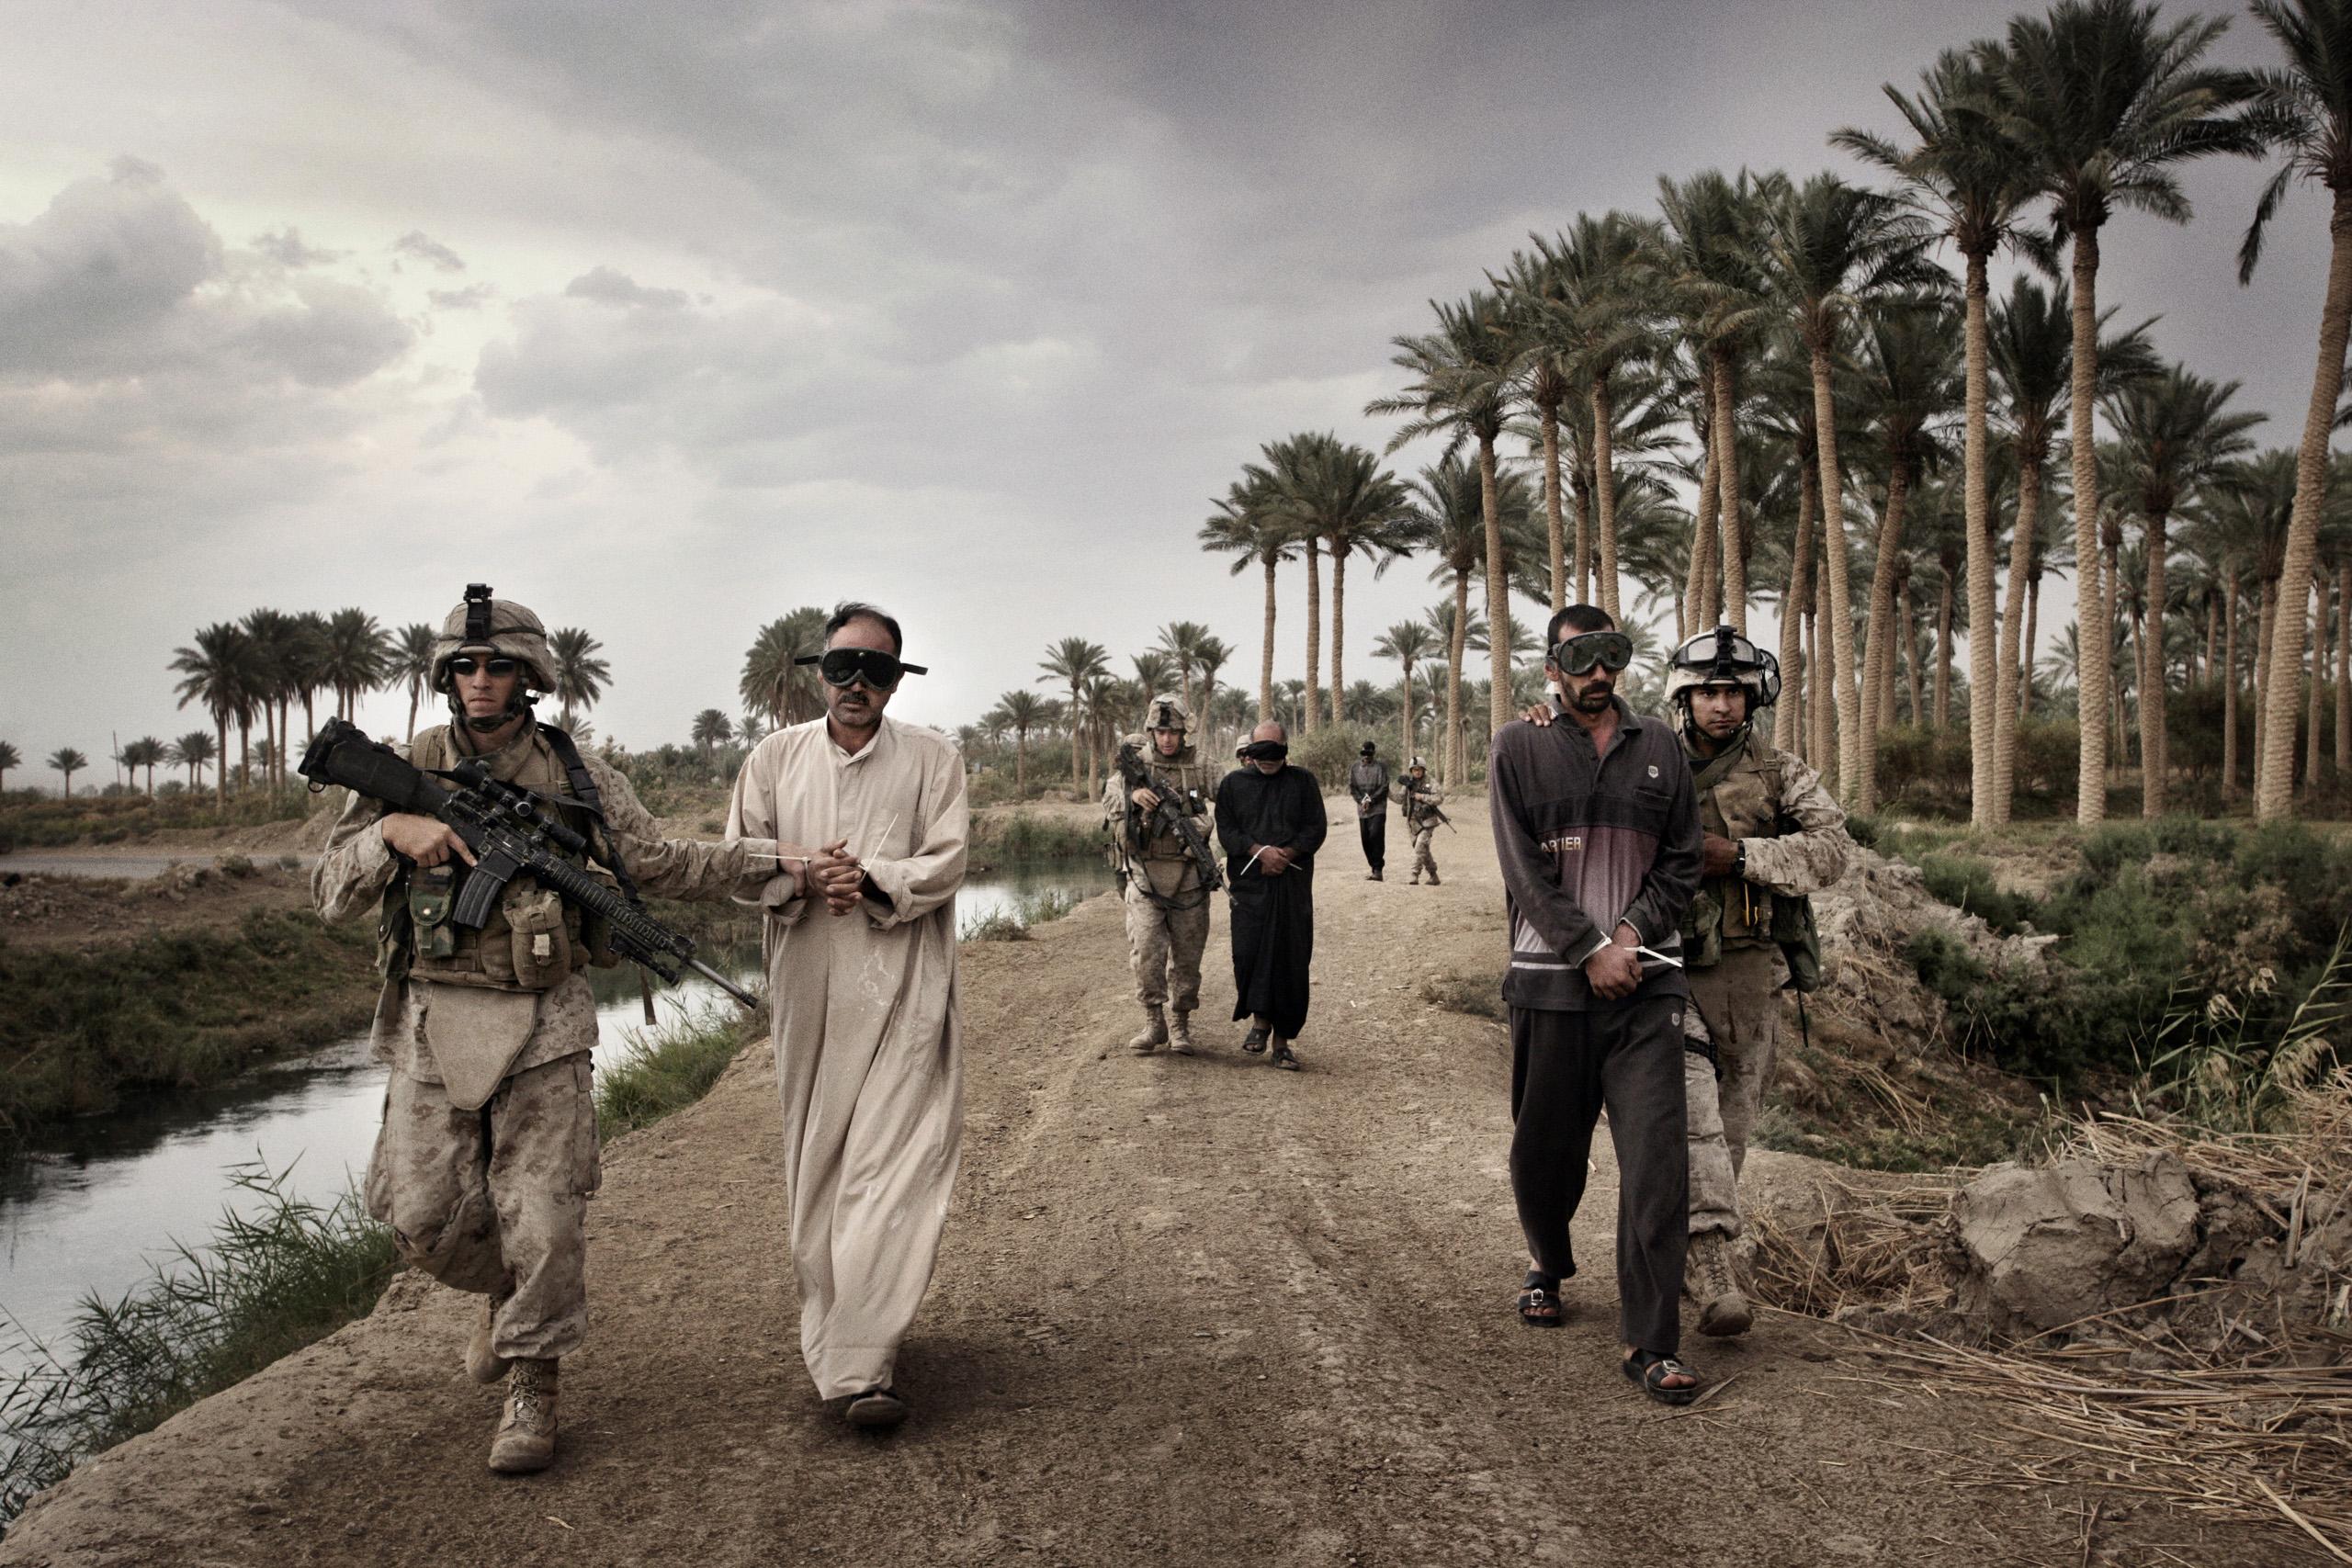 Marines escort suspected insurgents, including Ali Muhammad Said, accused of leading a mortar team in attacking Camp Delta outside al-Karmah, Fallujah, Iraq, Oct. 29, 2005.